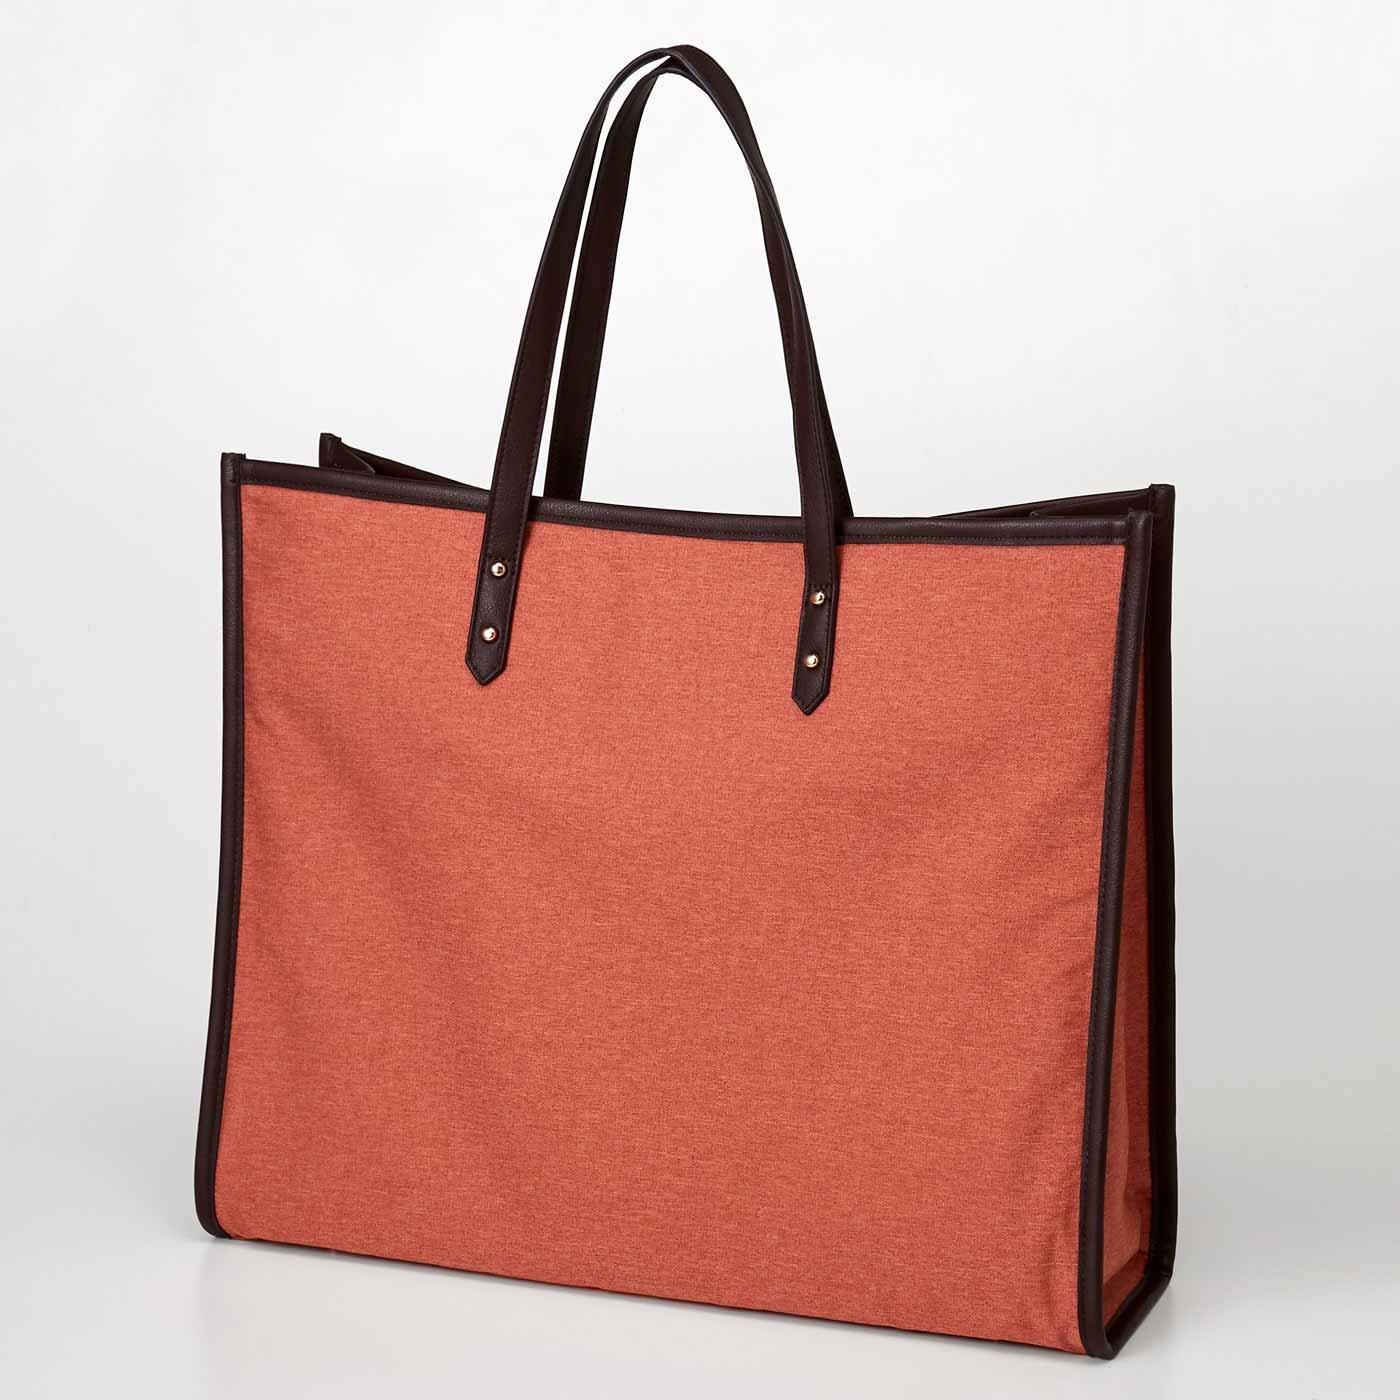 OSYAIRO ジャンボうちわが入るパイピングトートバッグ〈オレンジ〉